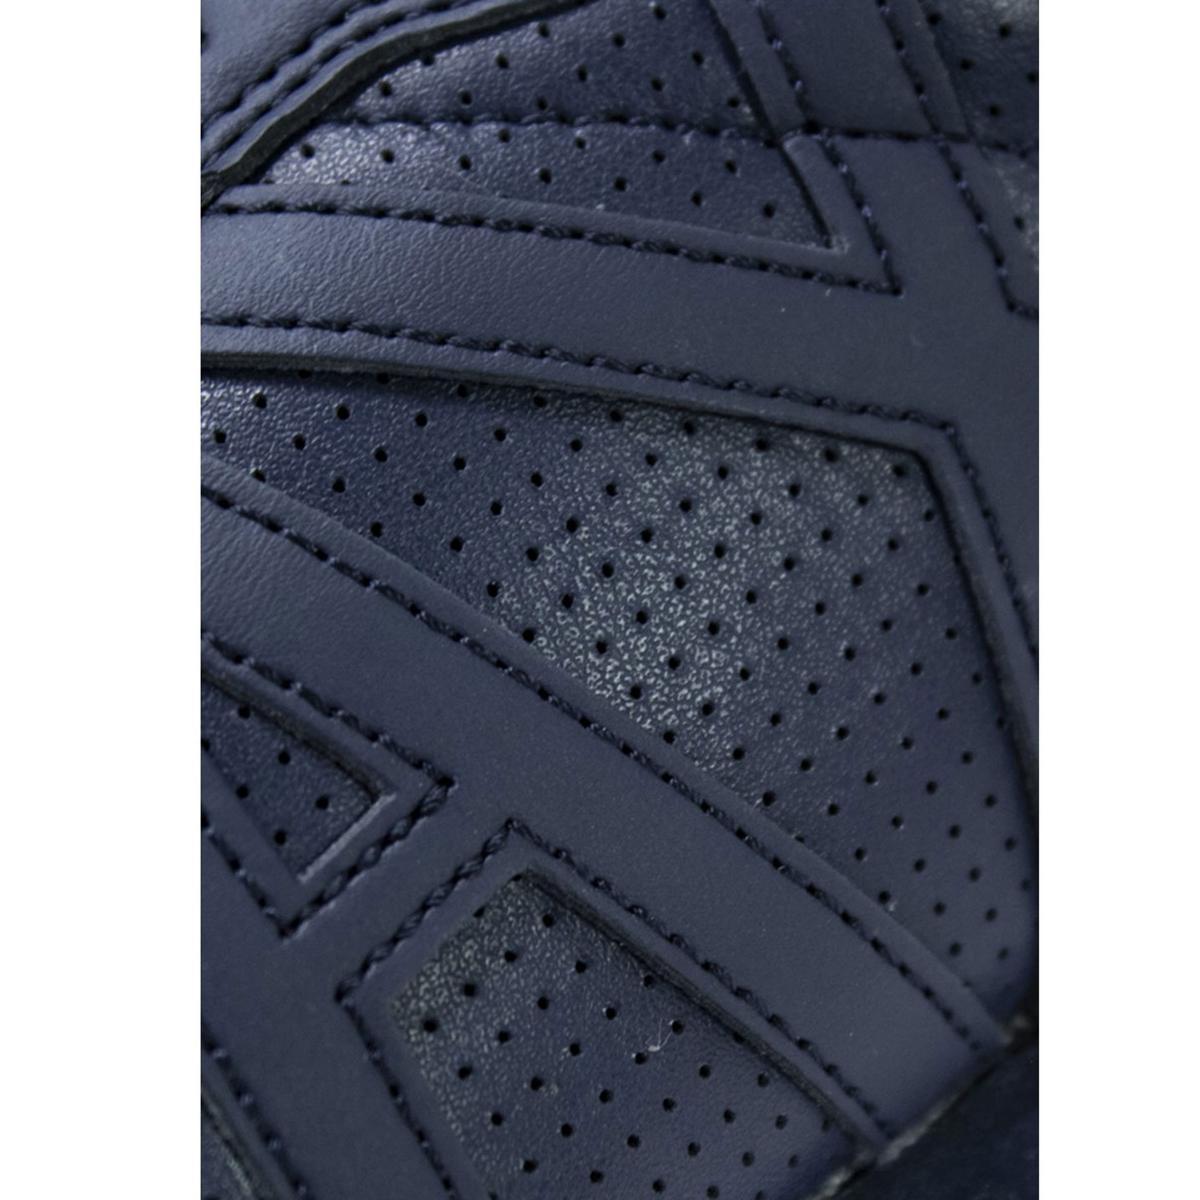 Scarpe da uomo Armani Exchange tinta unita colore blu in pelle traforata Rif. XUX017 XCC04 00285